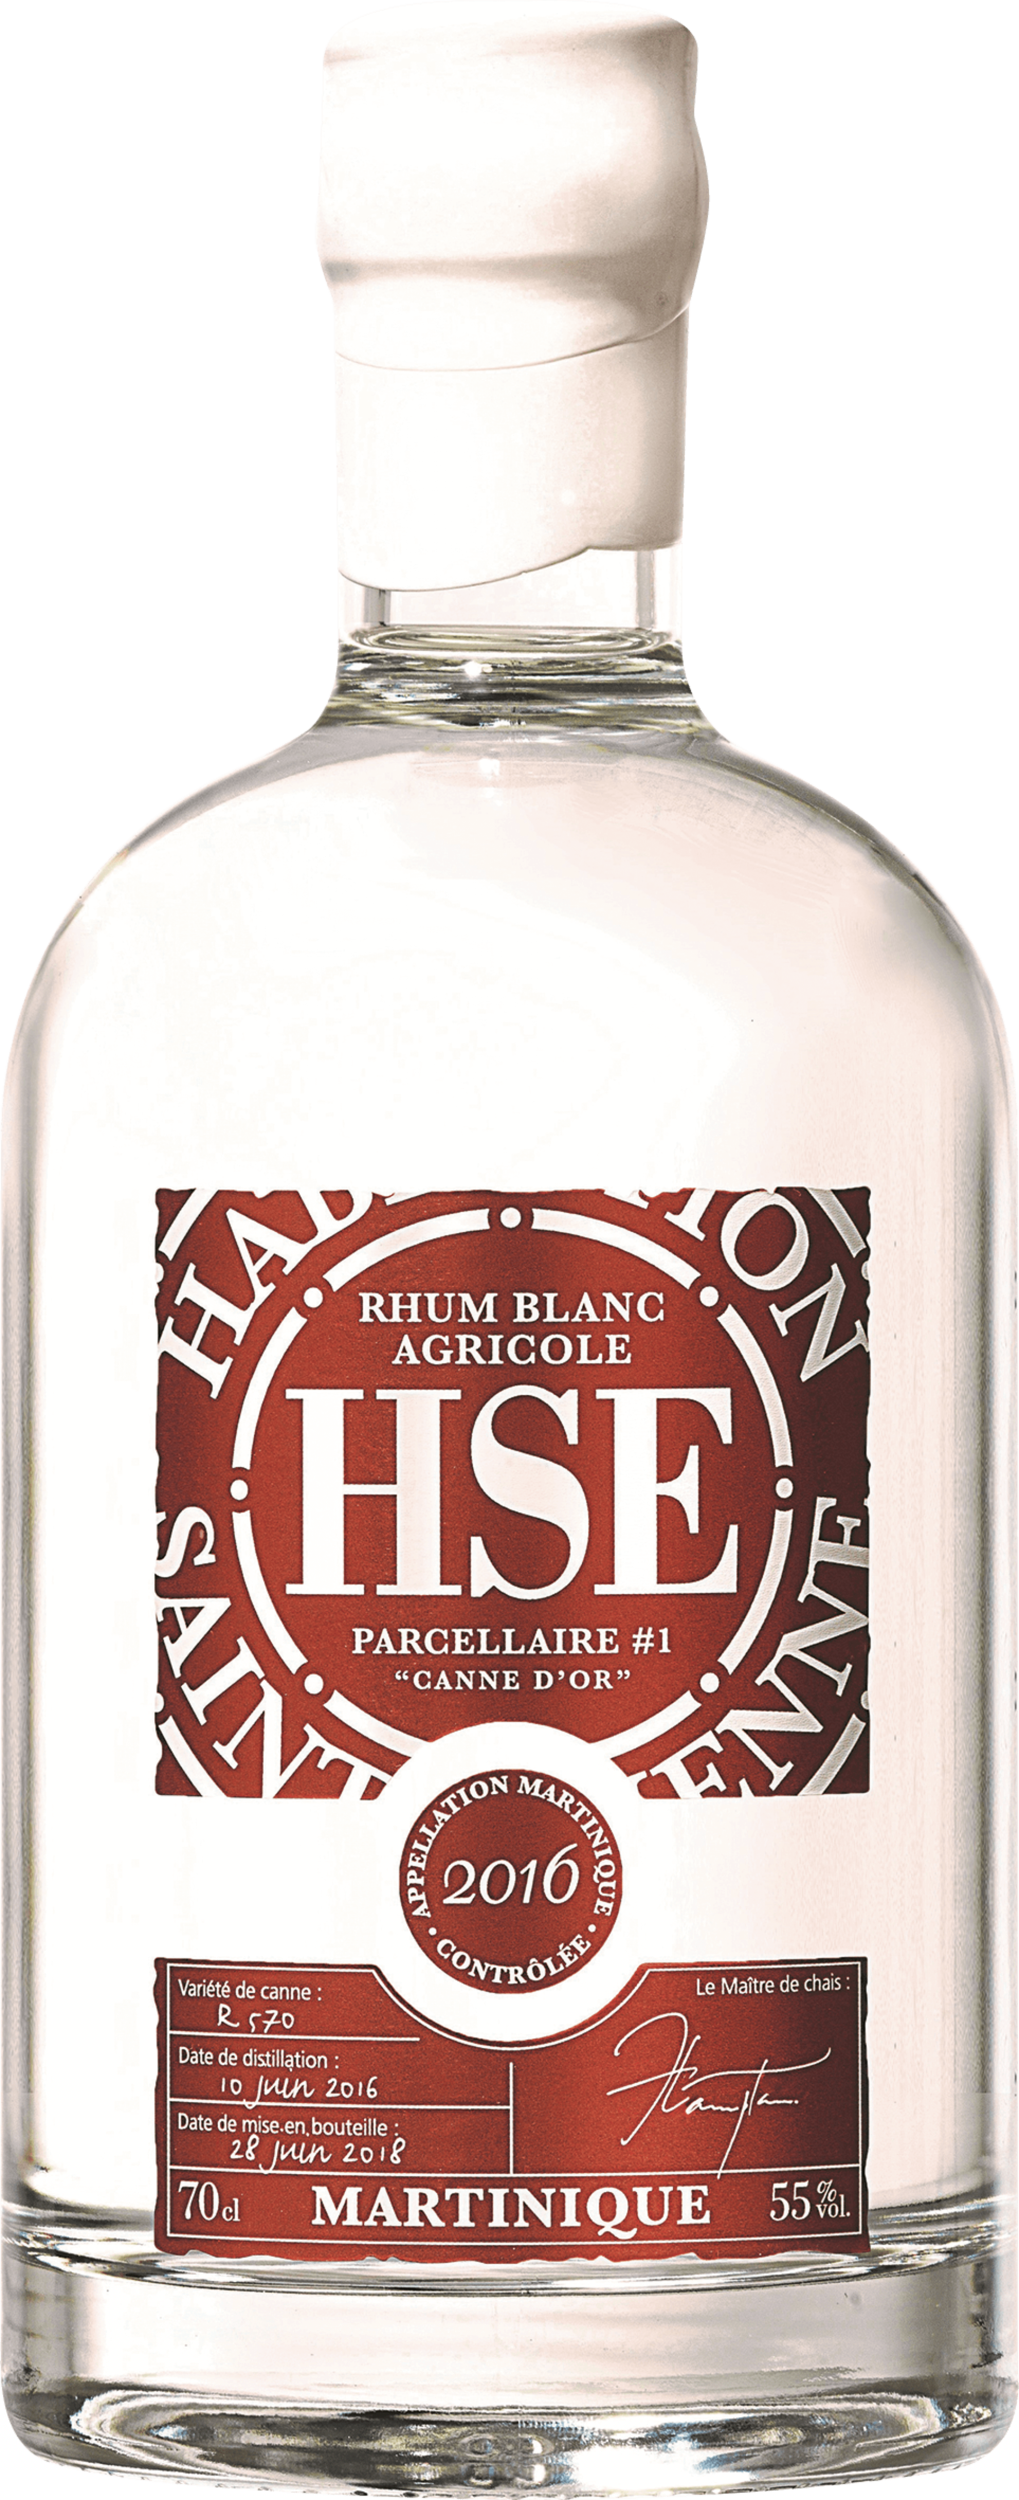 HSE, BLANC PARCELLAIRE #1 CANNE D\'OR 2016